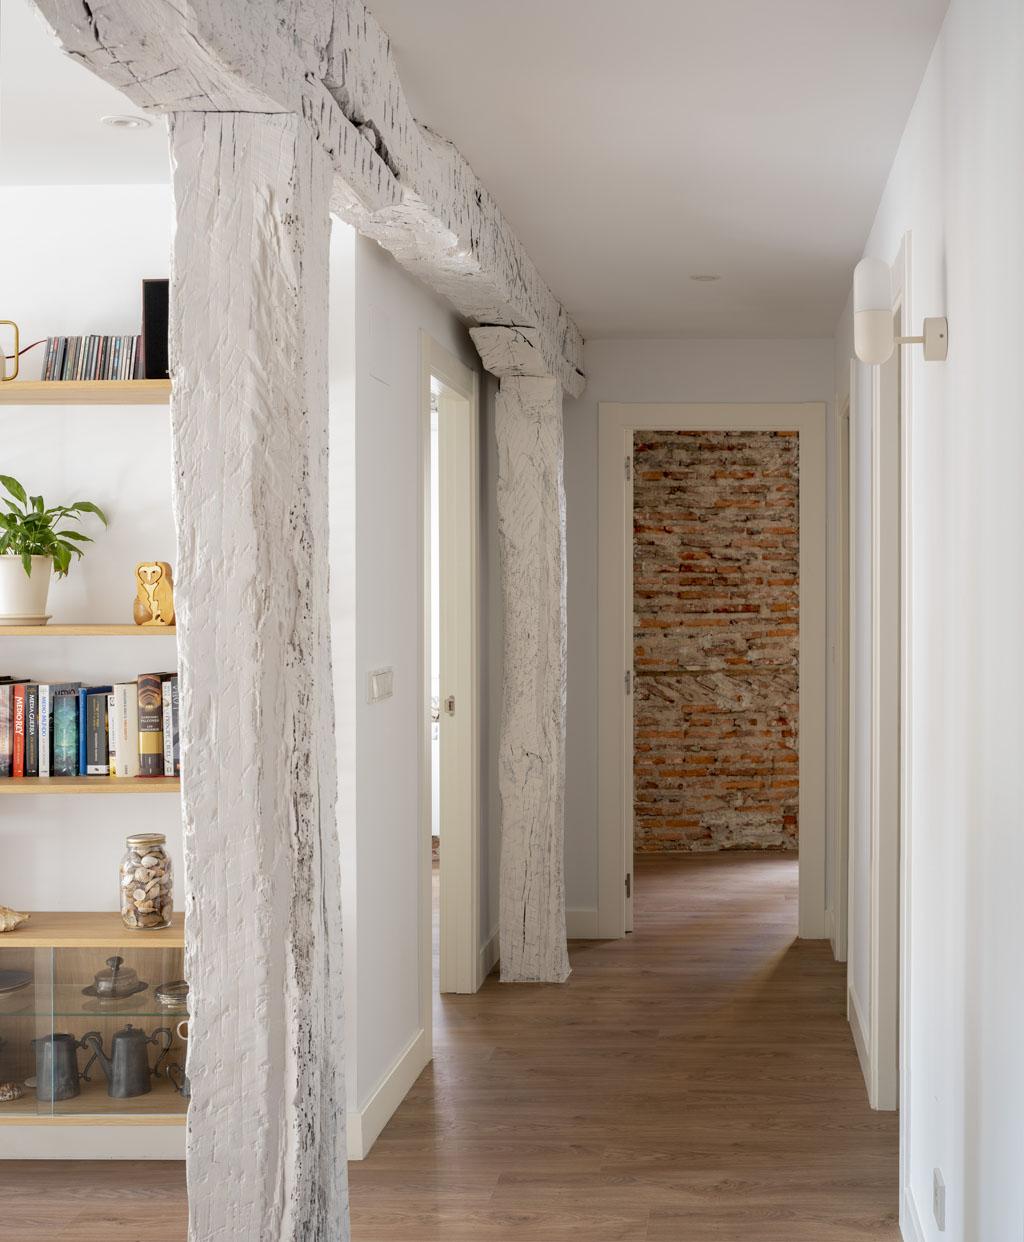 MUNDAKA_WEB_001-Erlantz Biderbost fotografo de arquitectura e interiores